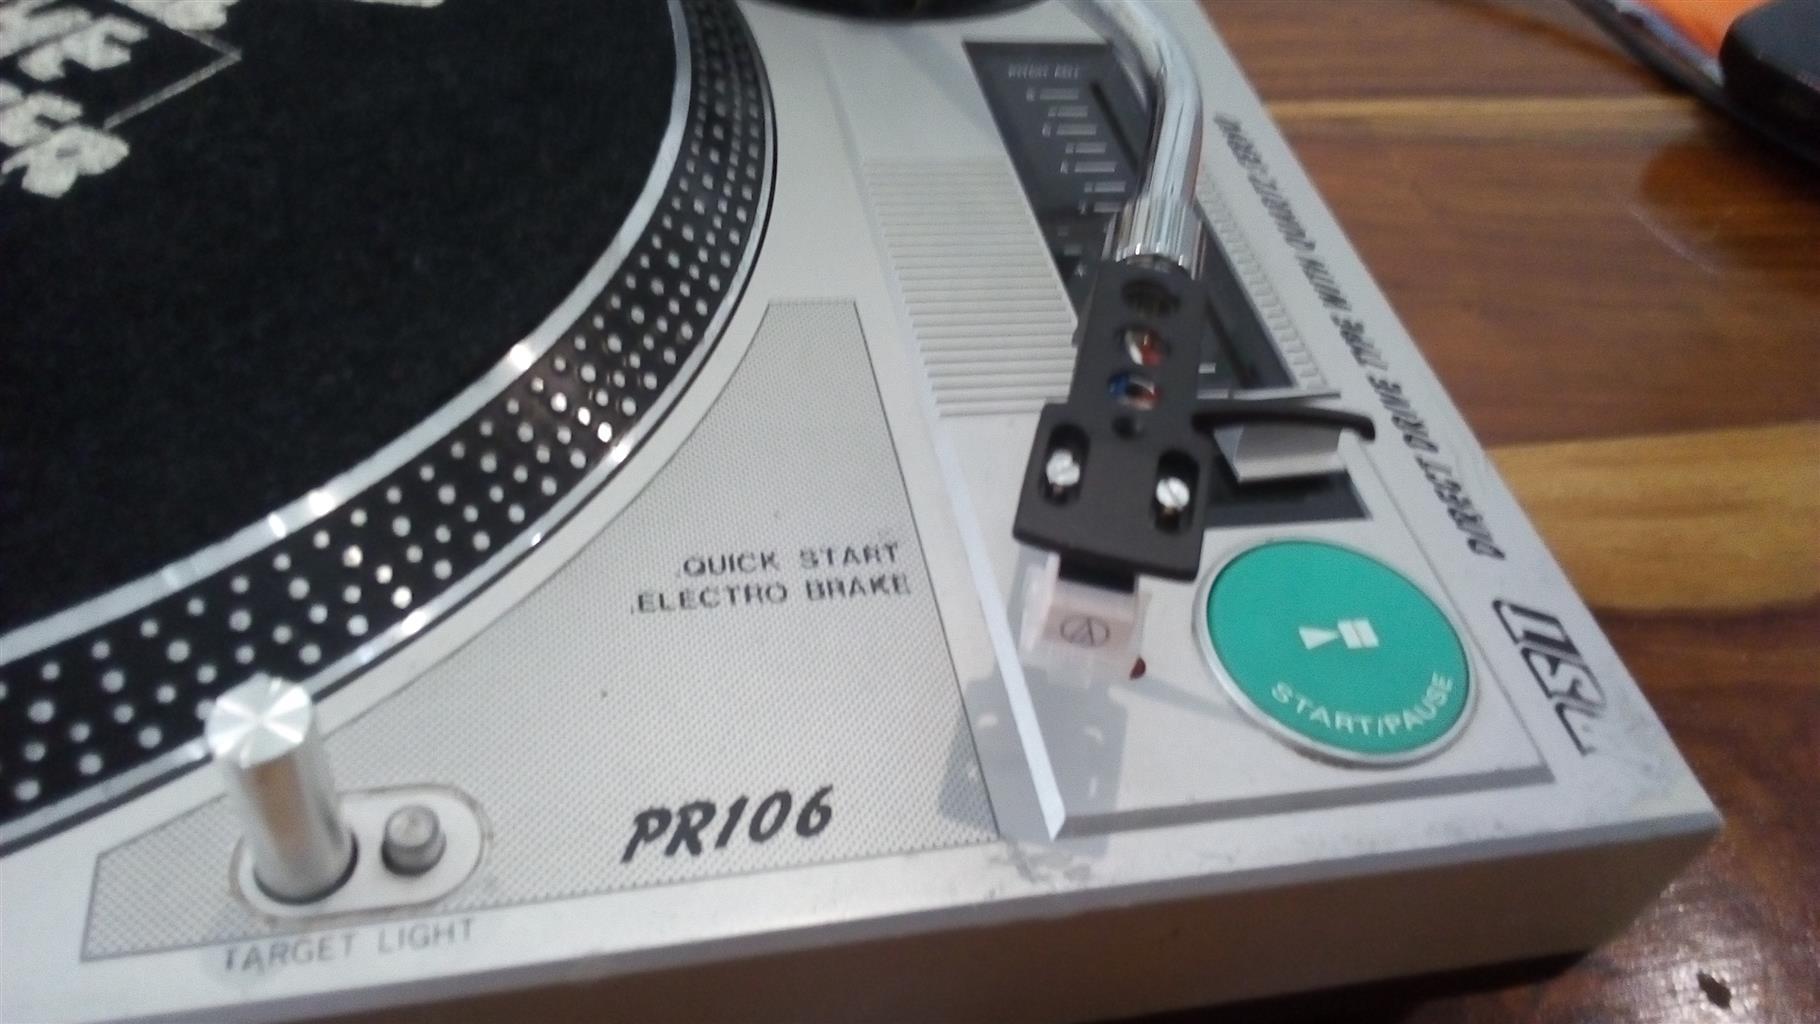 BST PR 106 Direct Drive DJ Turntable set